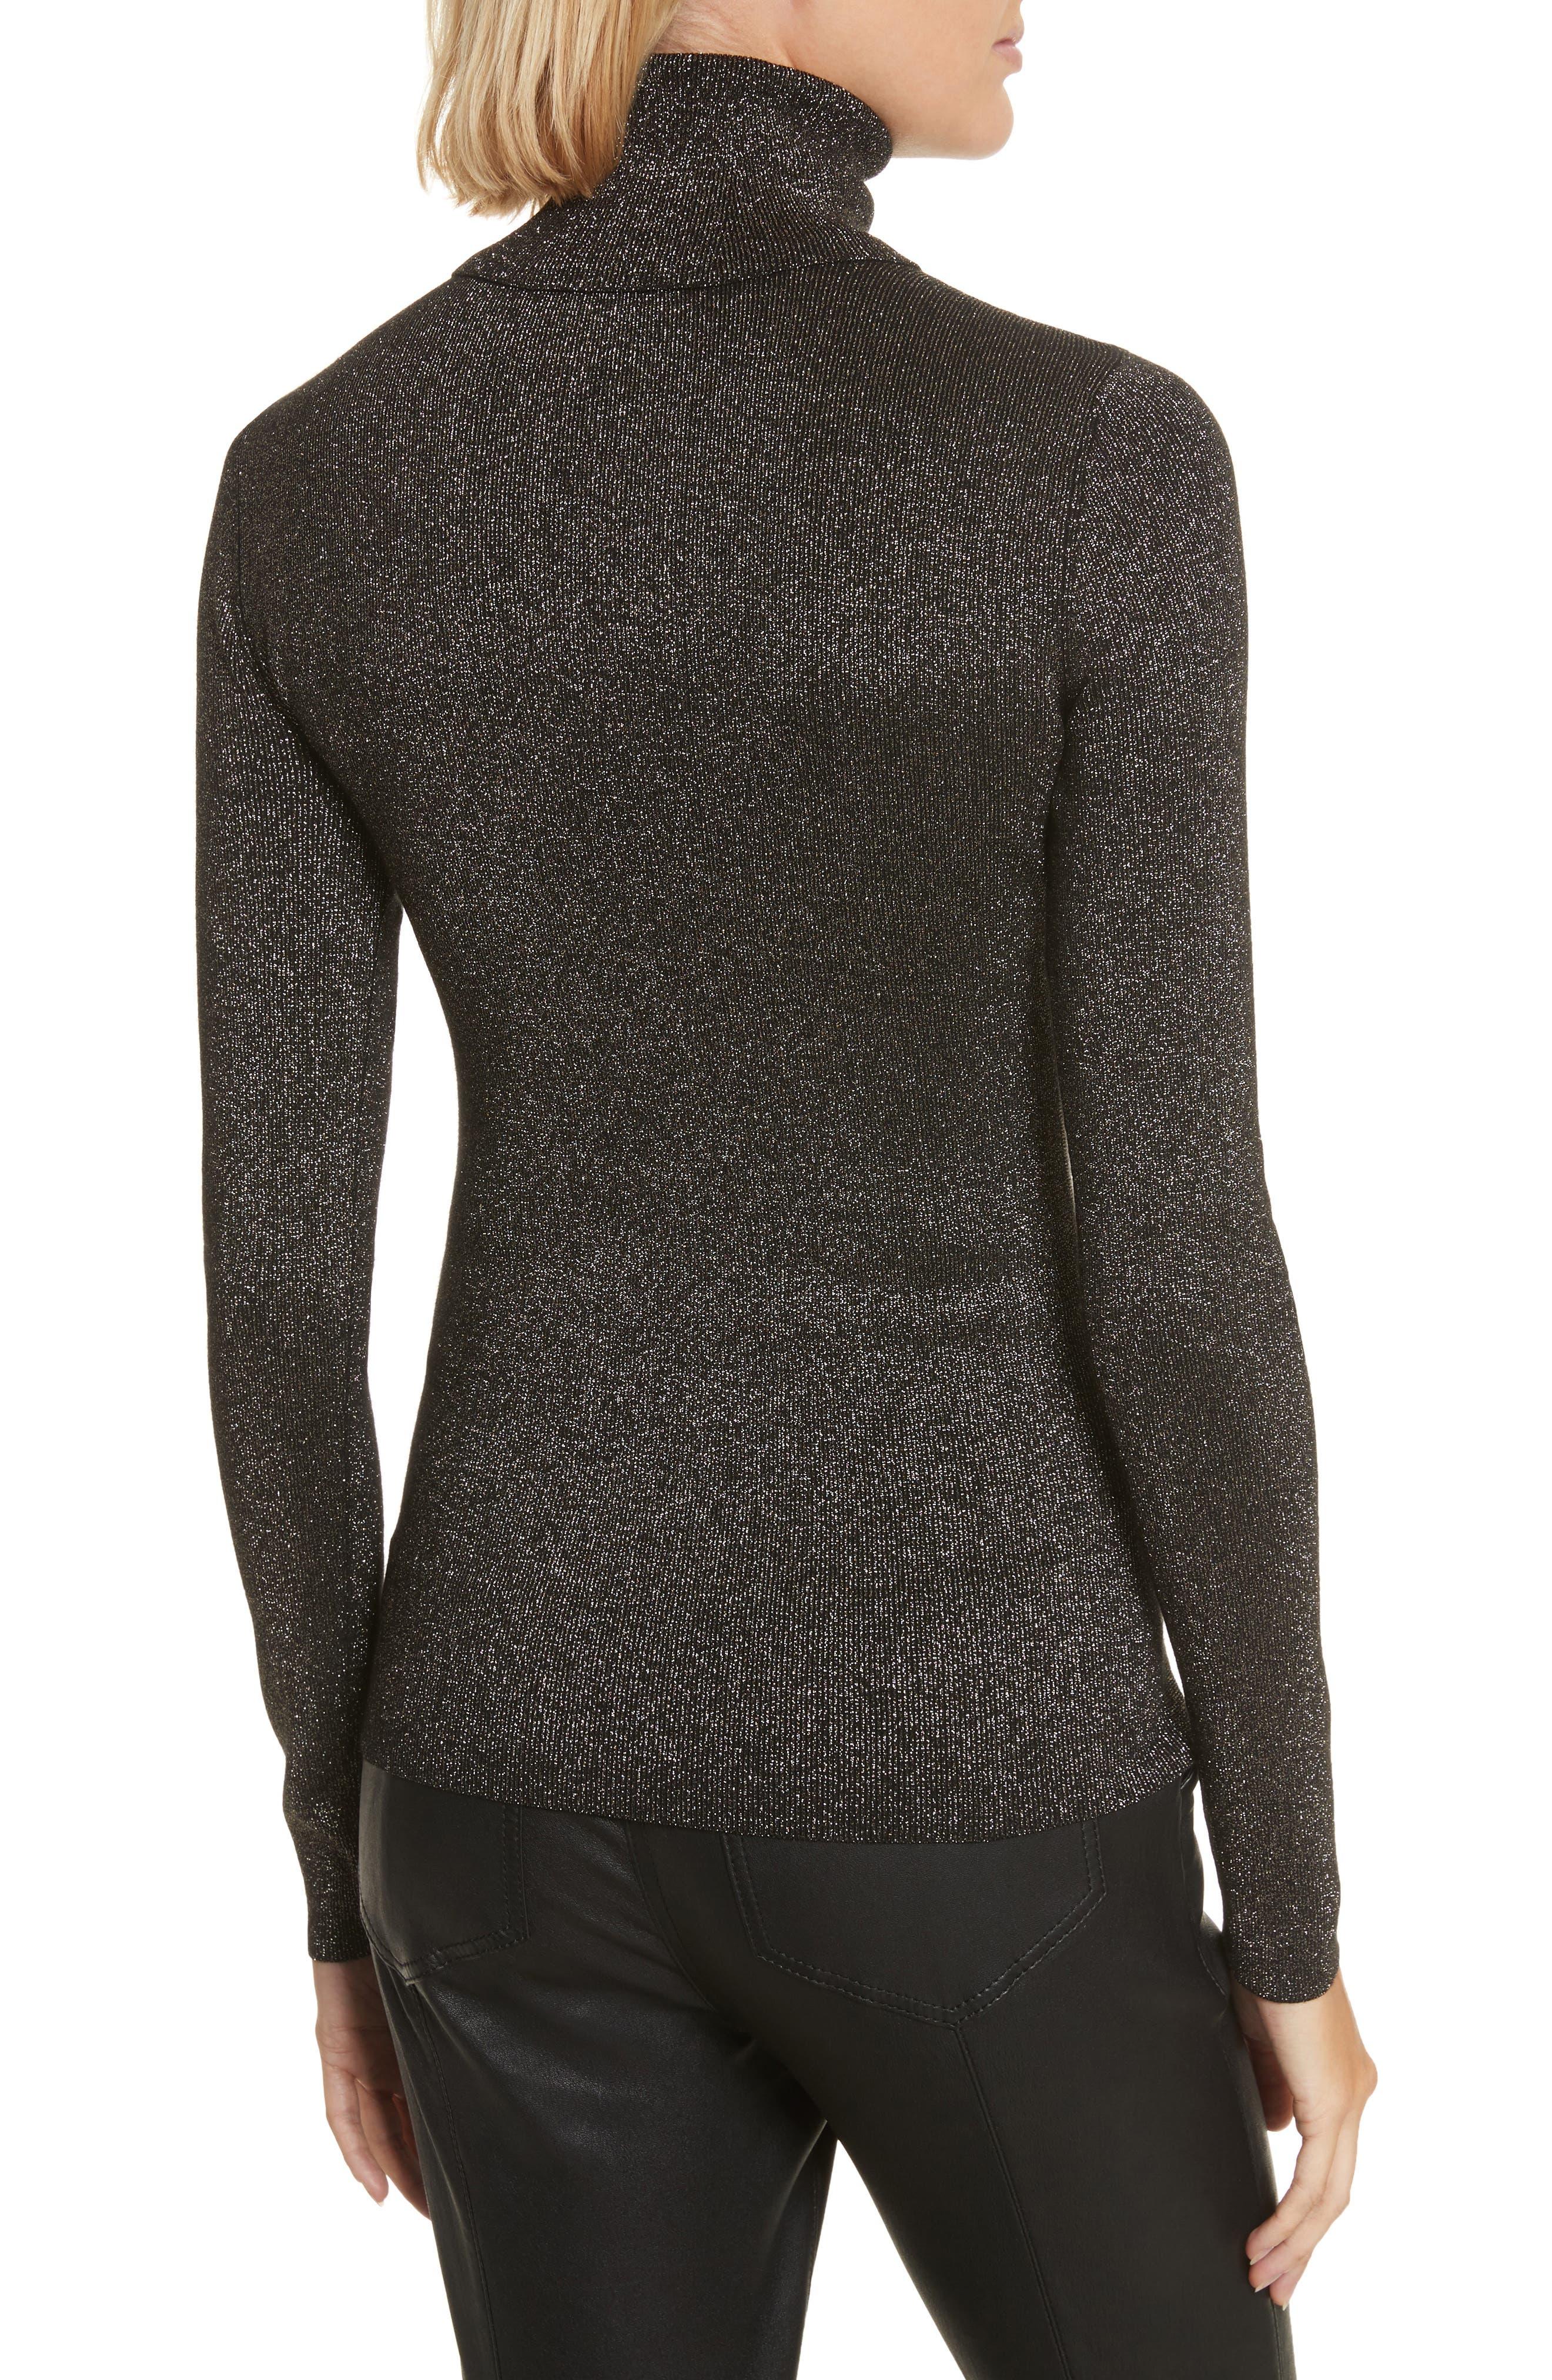 Camden Cutout Sweater,                             Alternate thumbnail 2, color,                             Black/ Gold